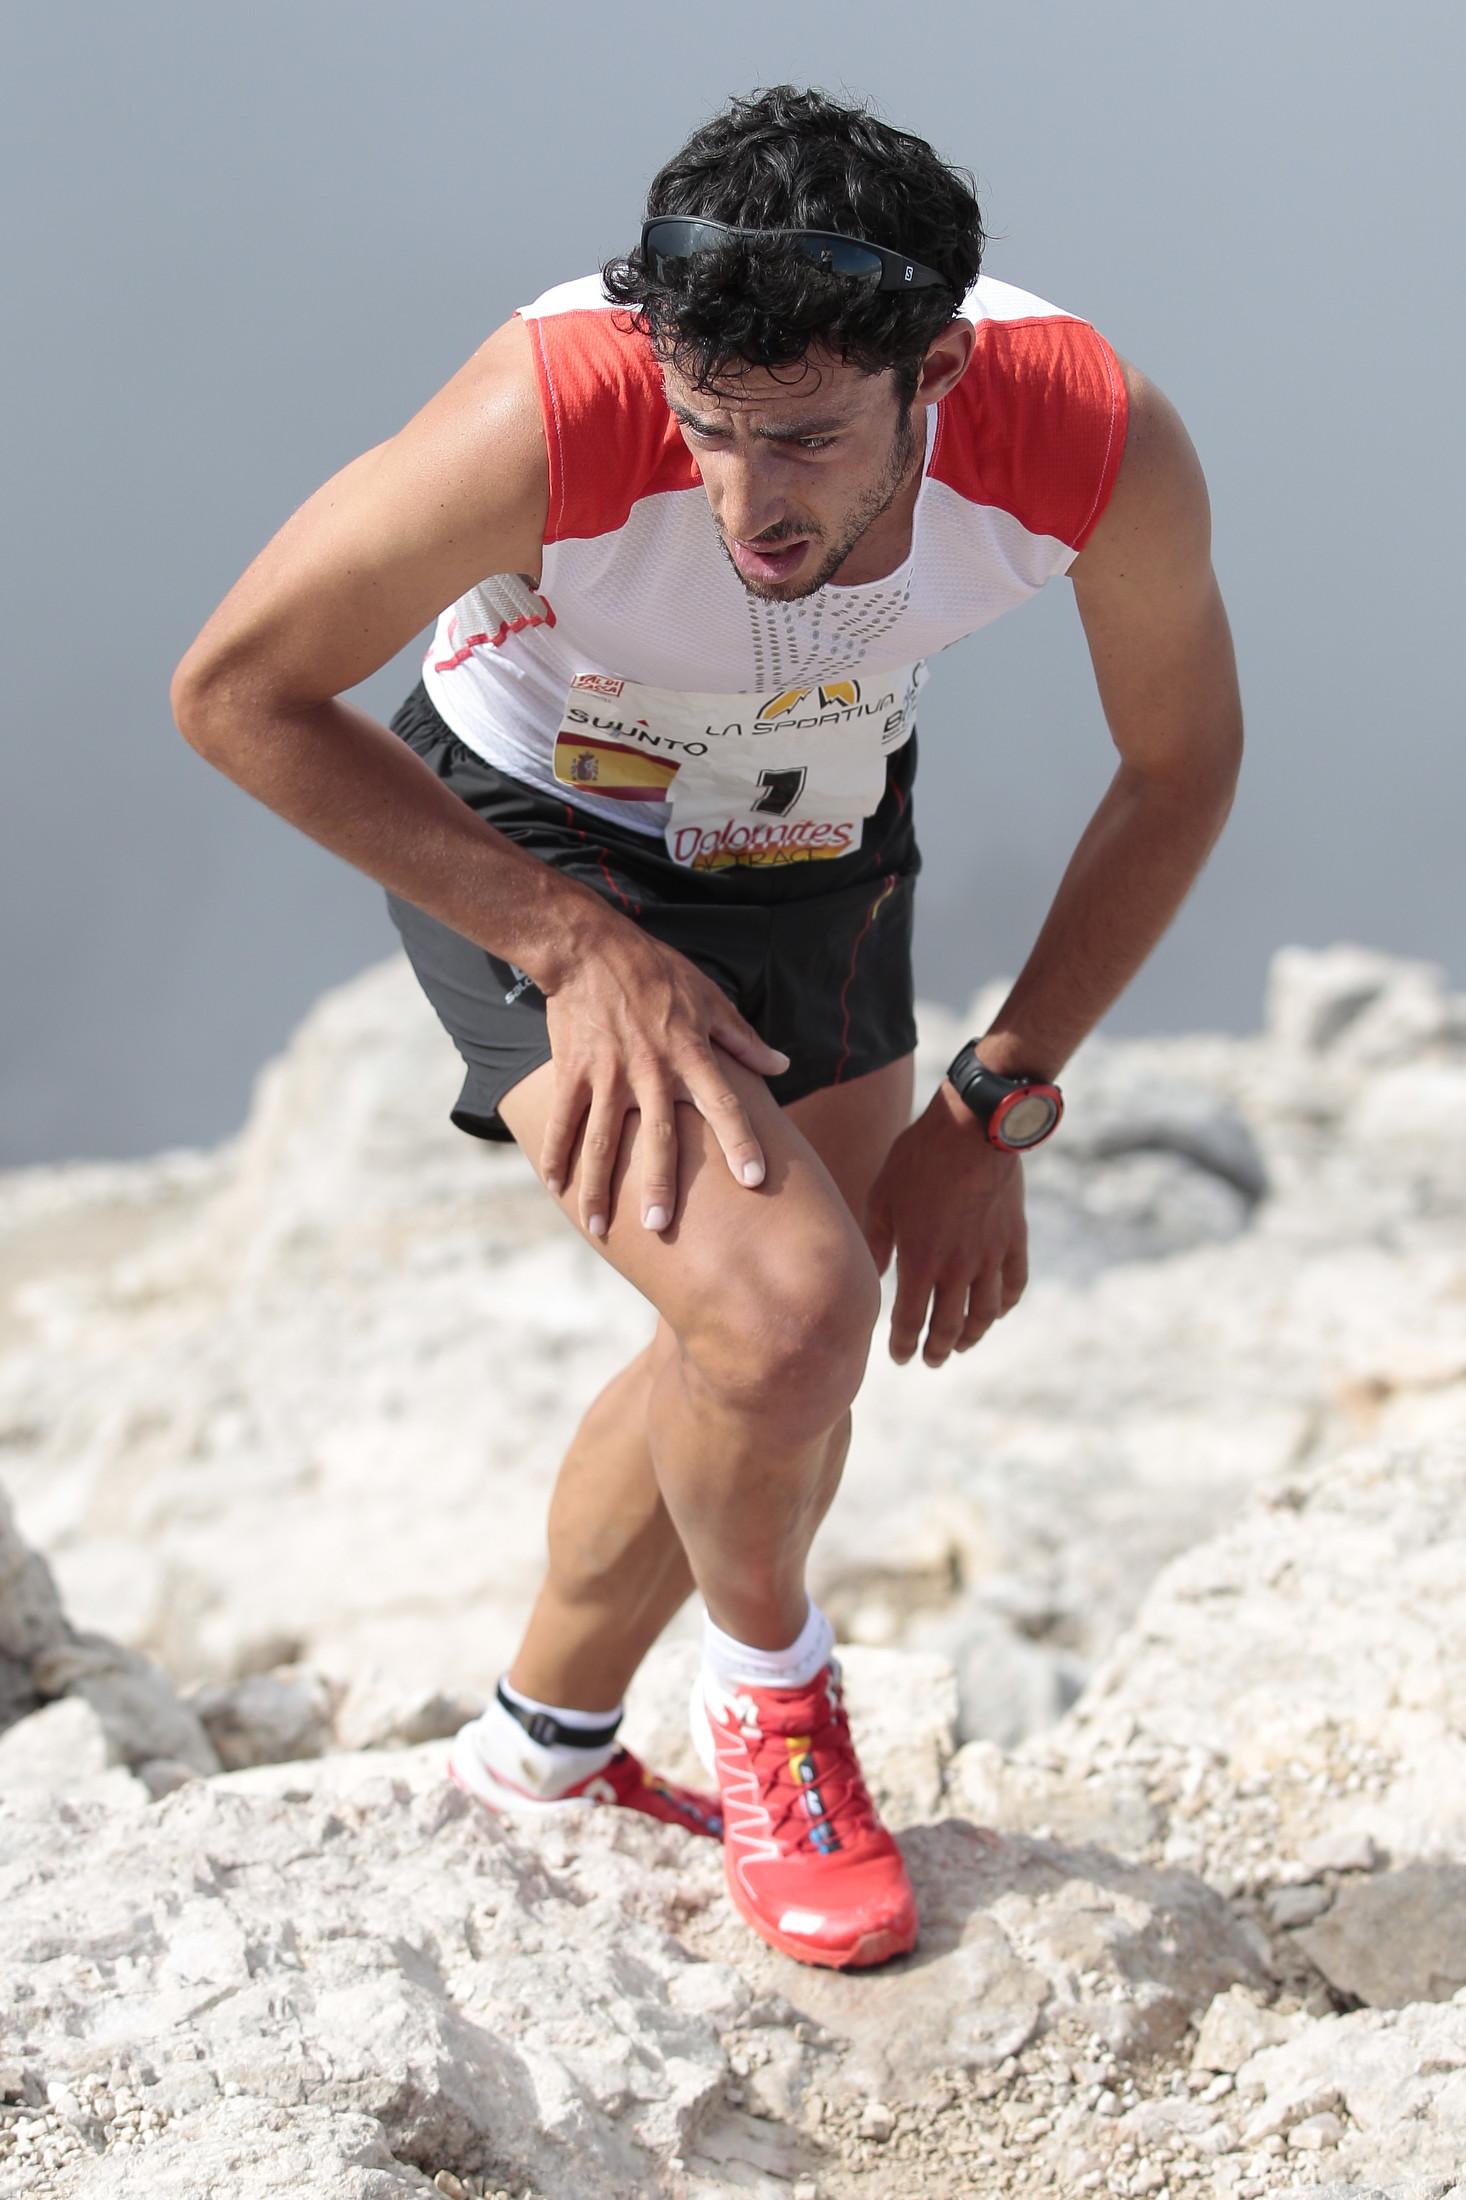 Video Dolomites SkyRace 2013, vincono Forsberg e Jornet